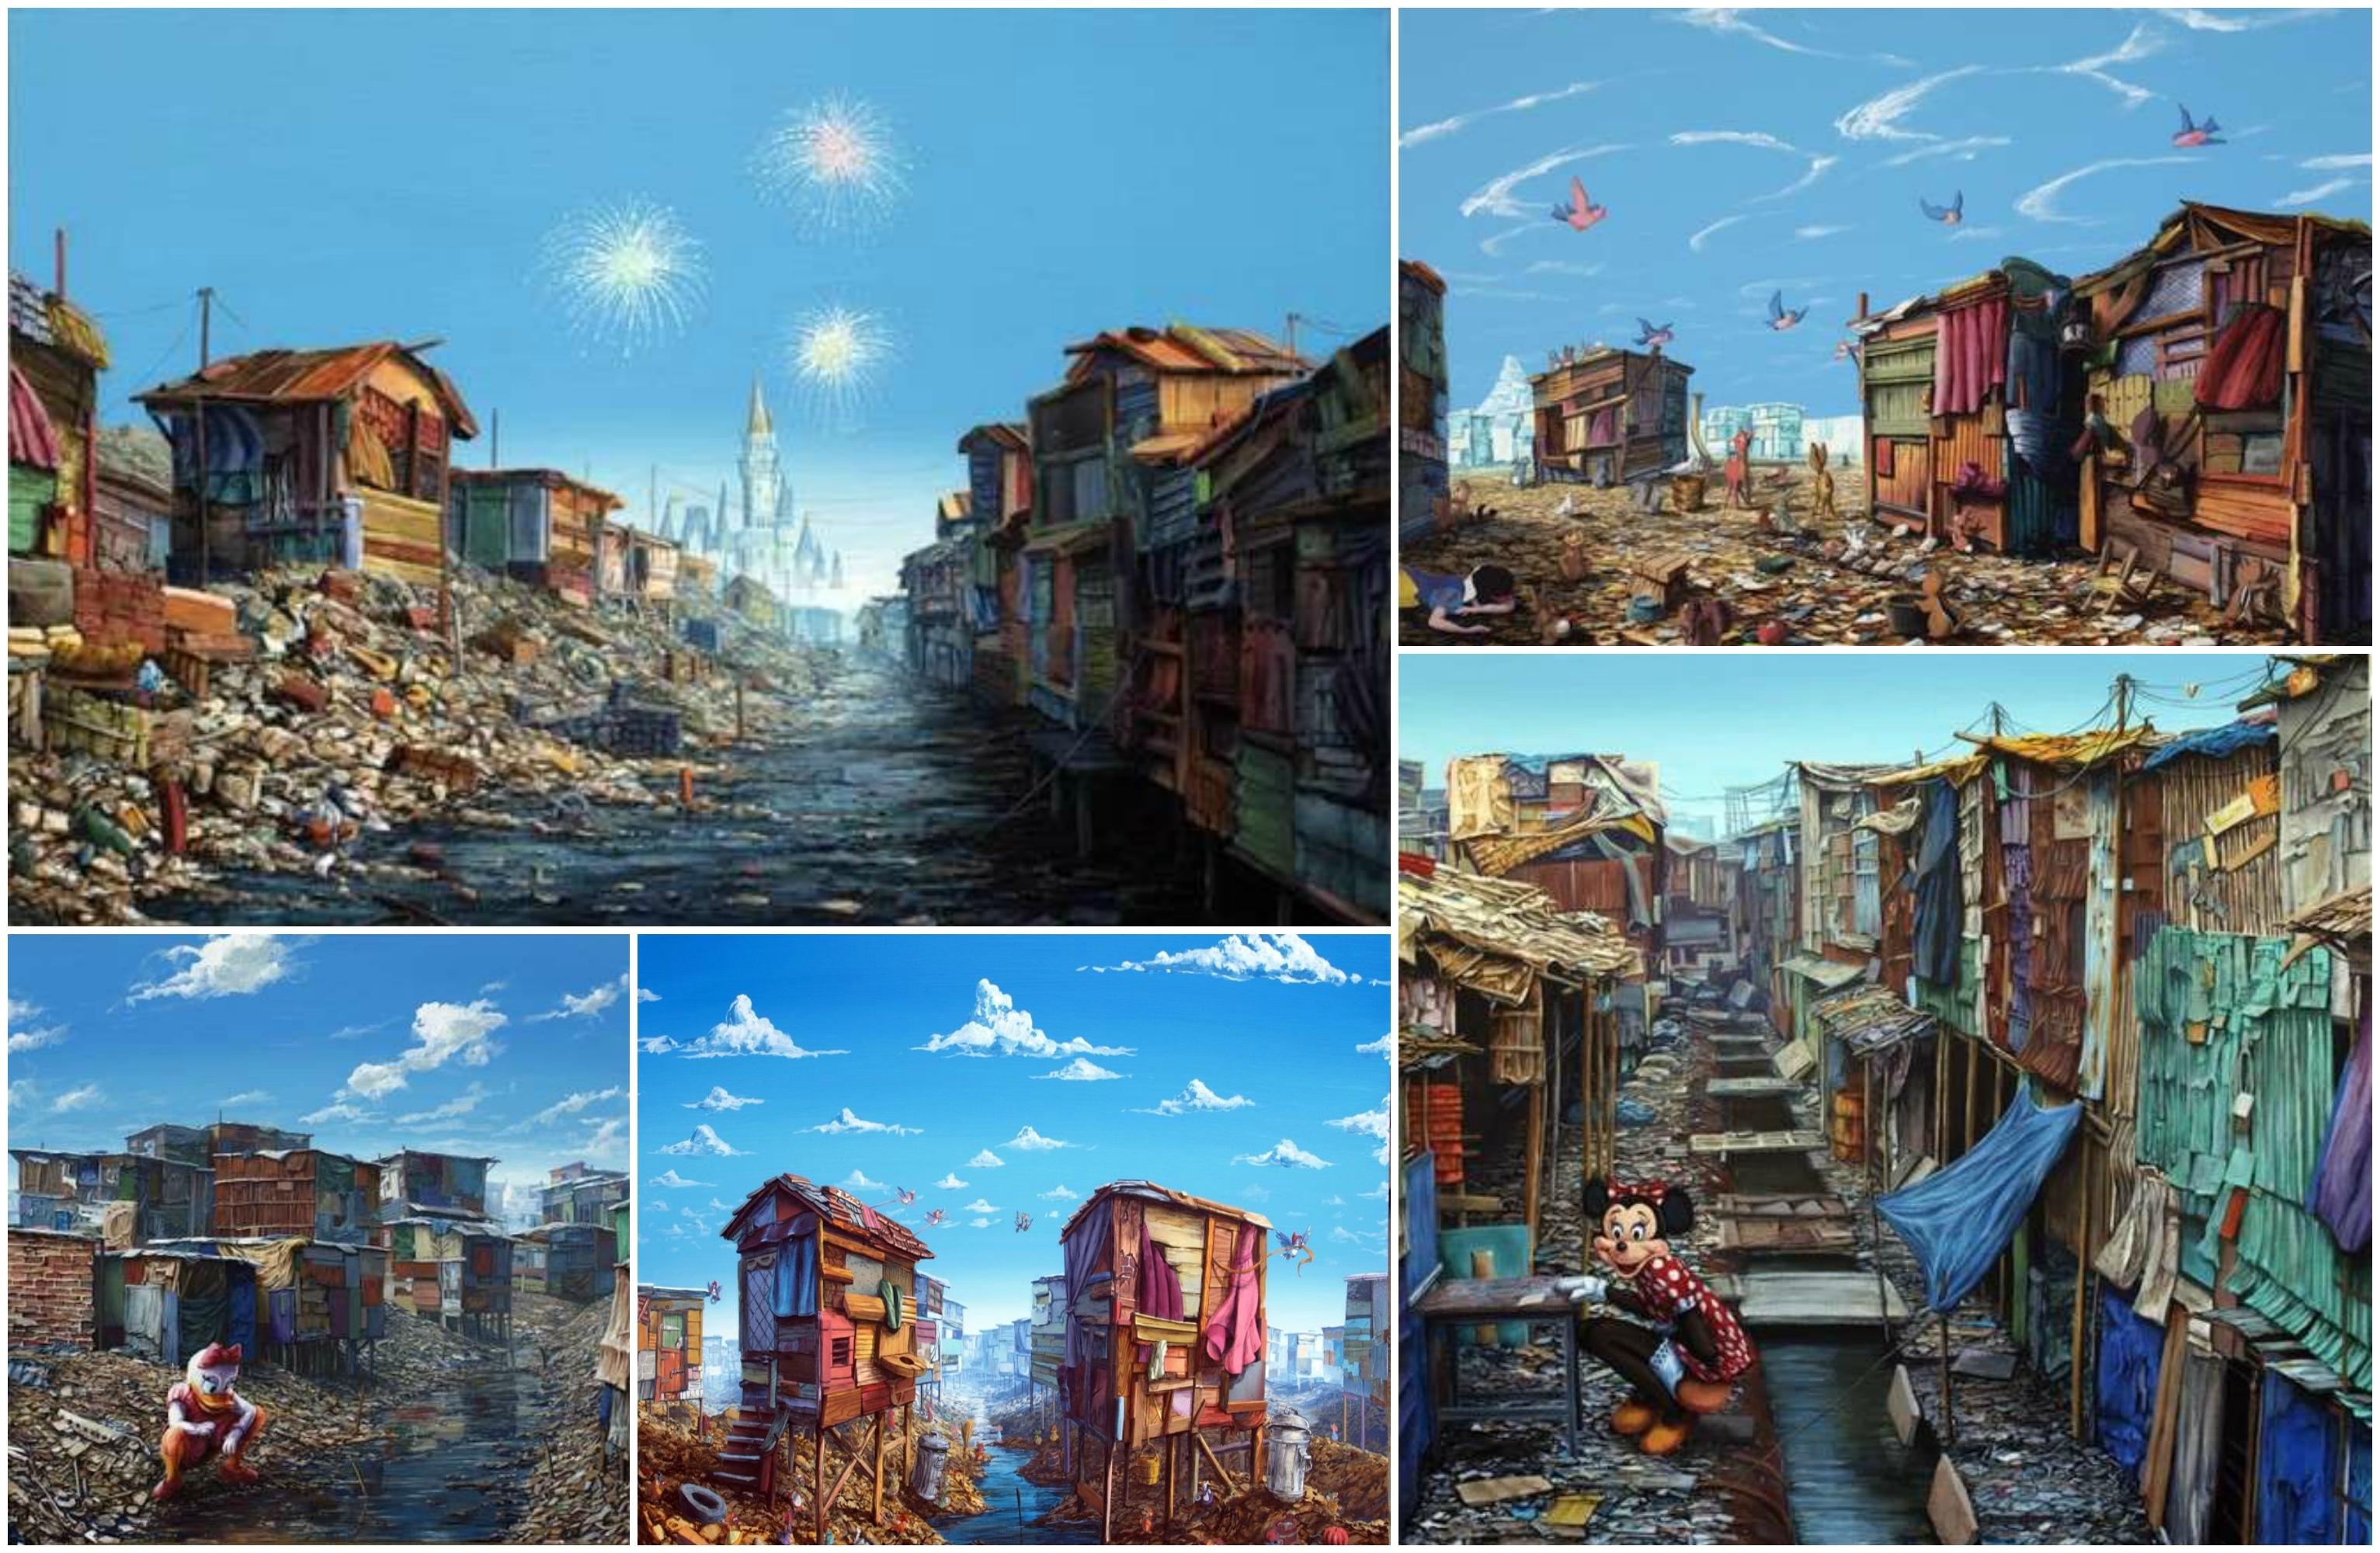 Dismayland Collage.jpg